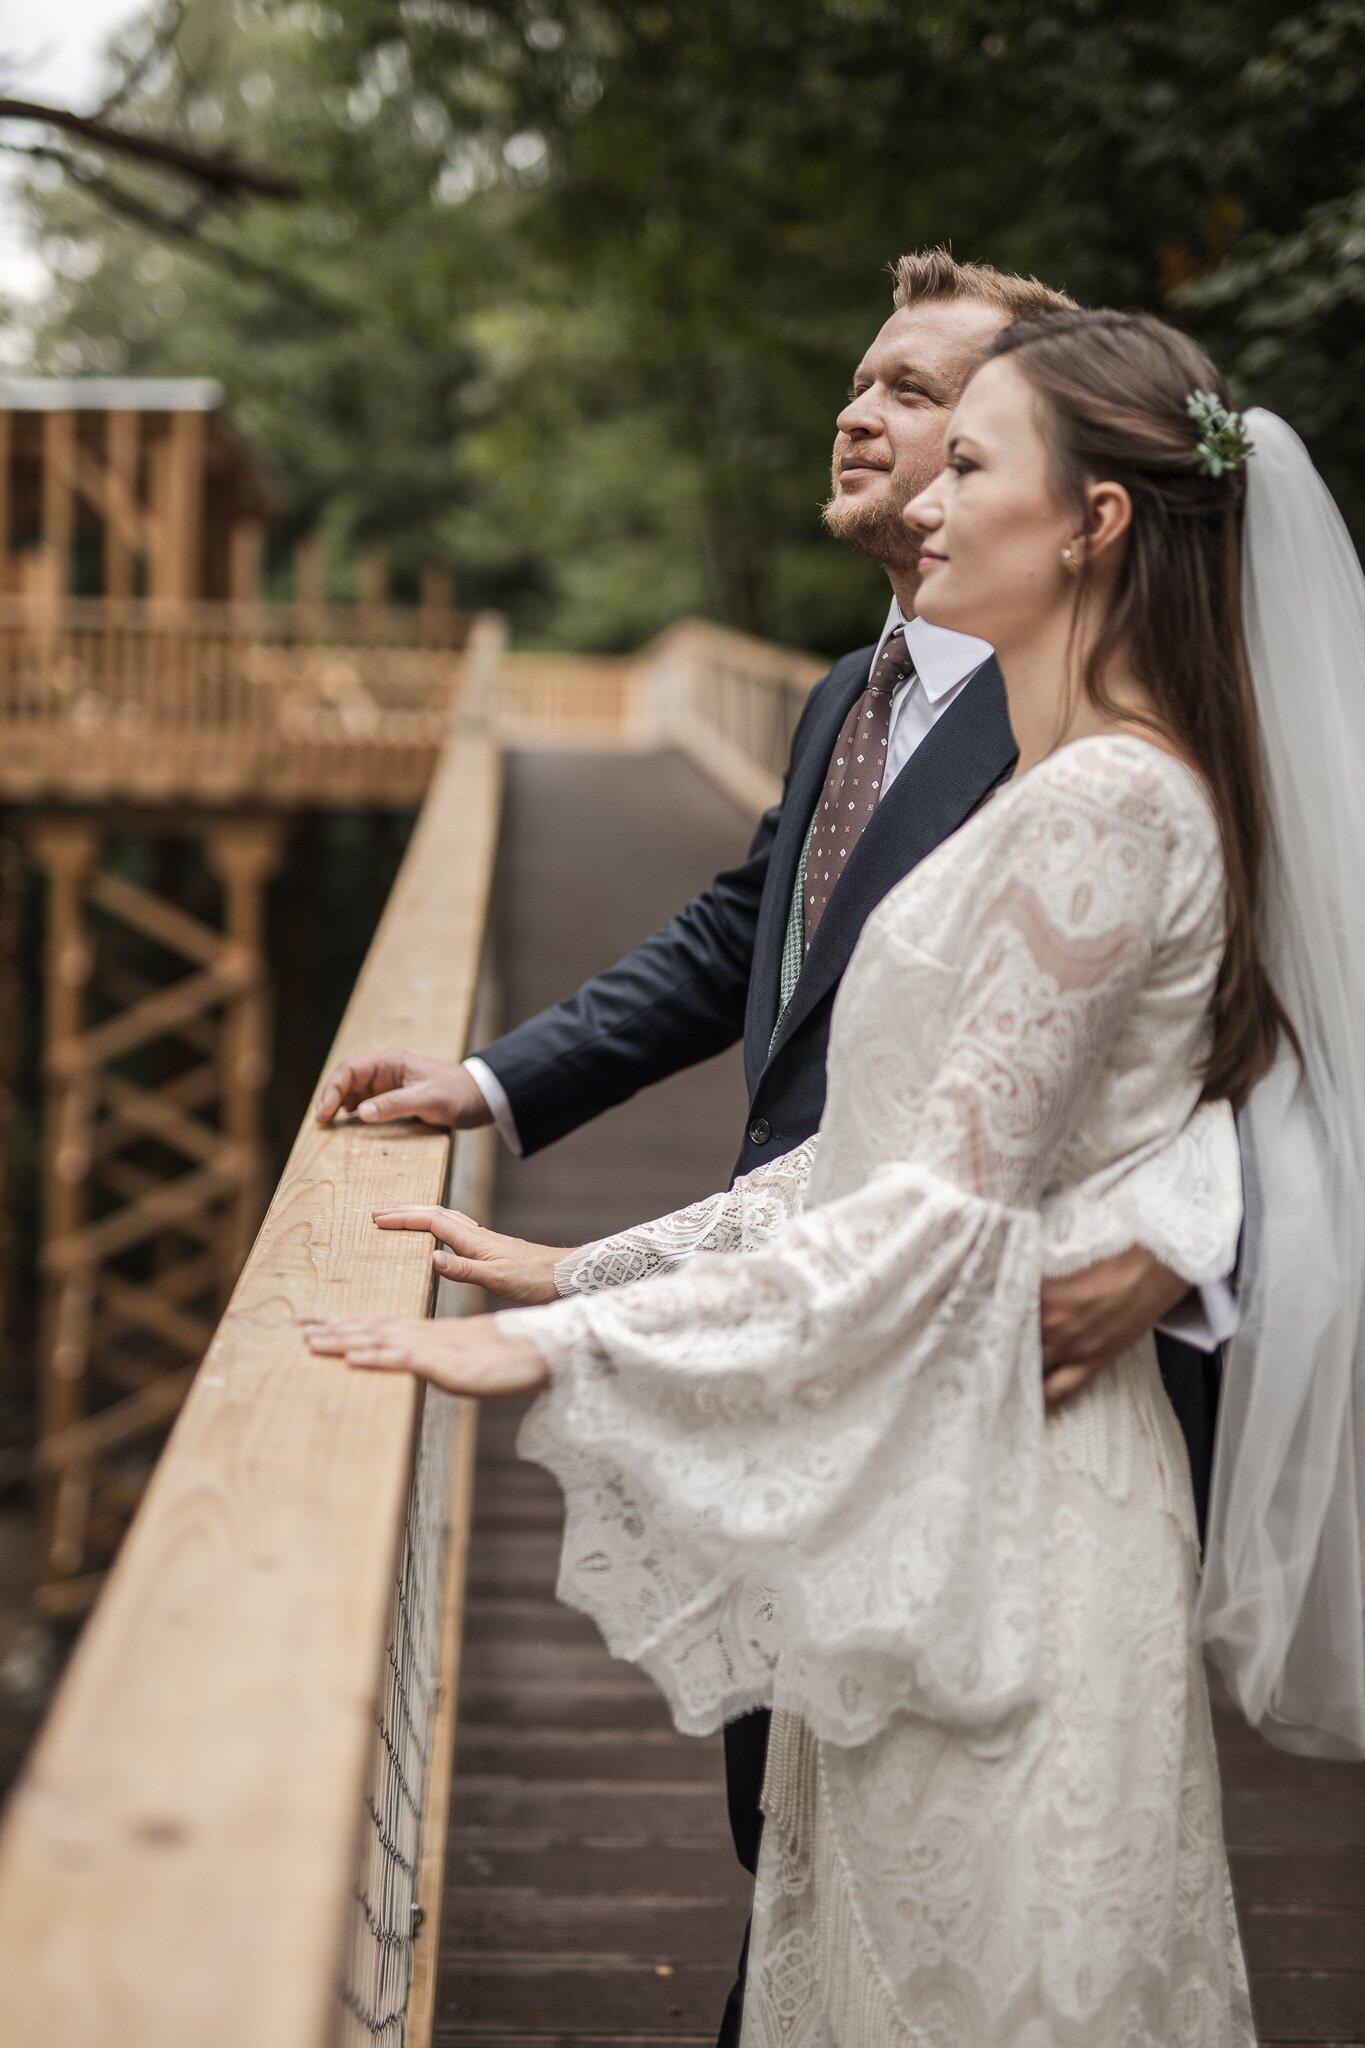 Sesja ślubna - Marta i Kuba - IMG_5450